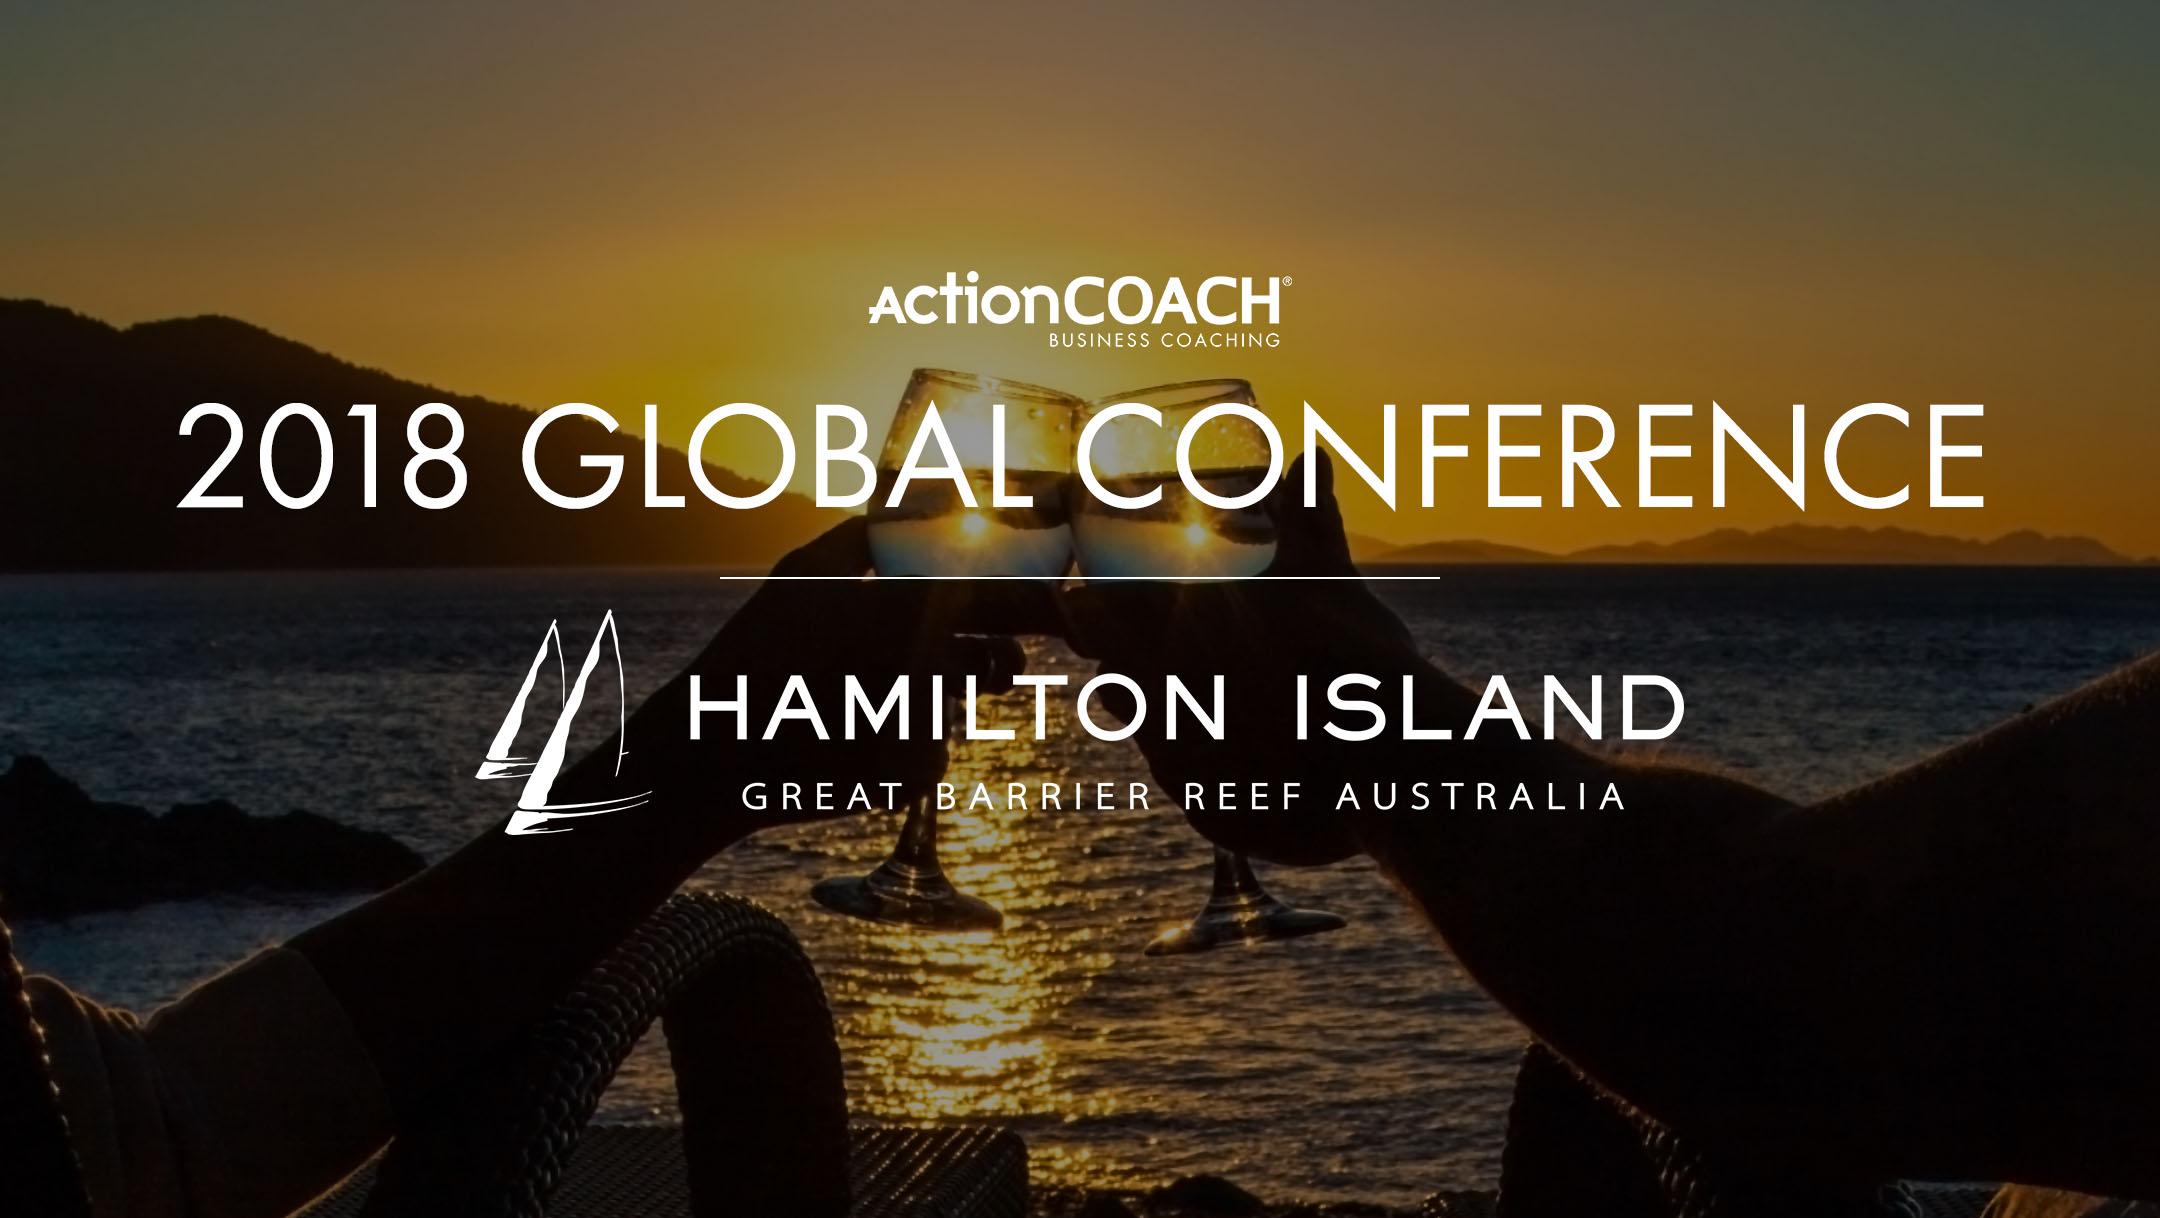 Global Conference 2018 image banner